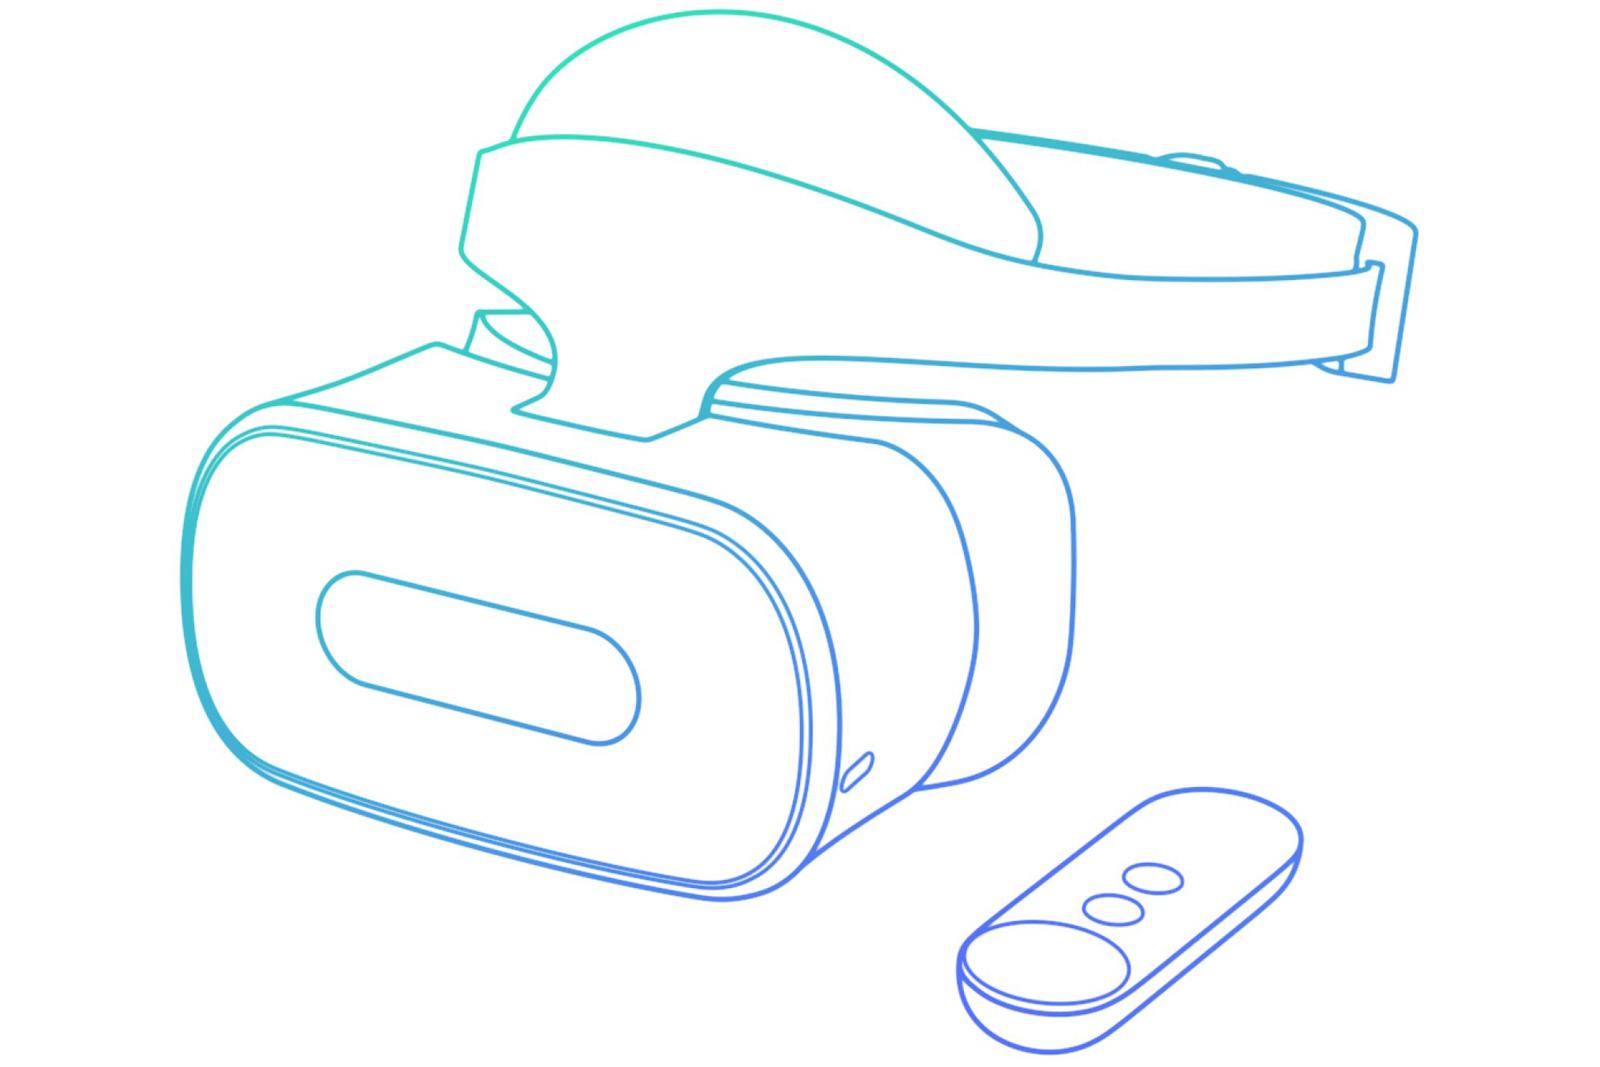 Lenovo's standalone Daydream VR headset